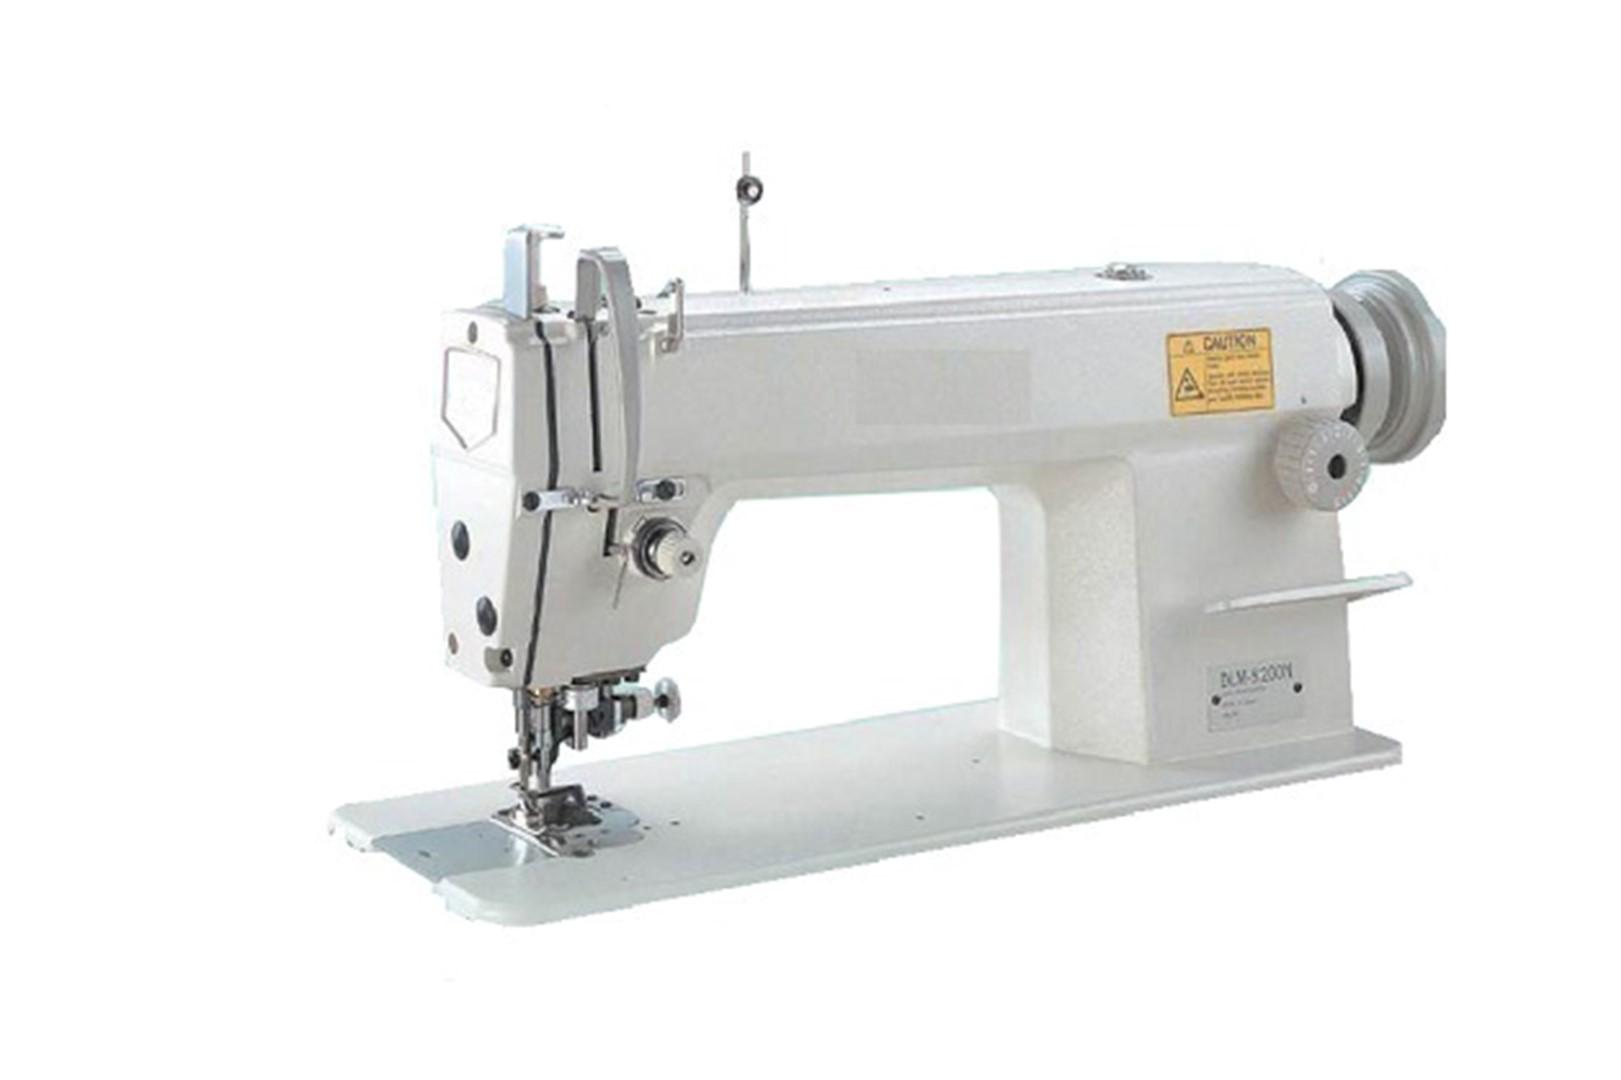 garment_0002_juki-industrial-sewing-machine-single-needle-500x500